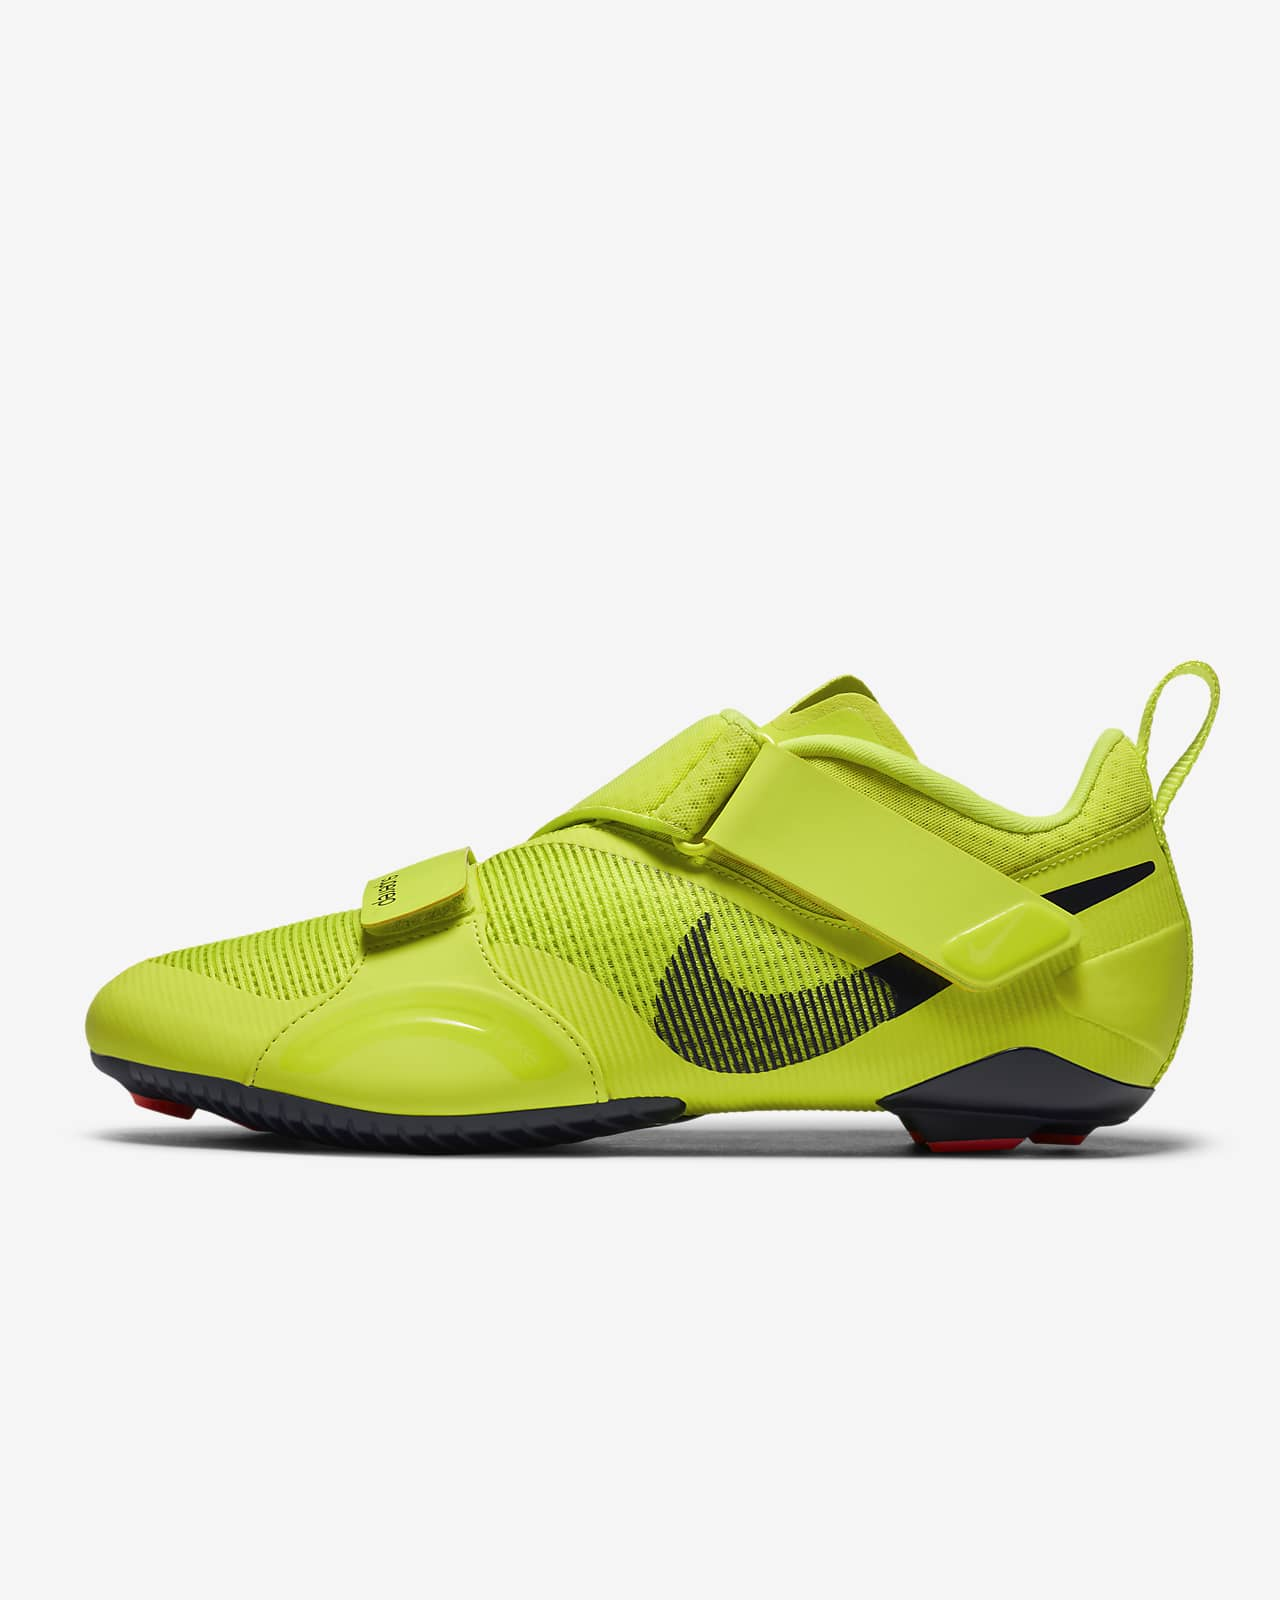 Nike SuperRep Cycle Men's Indoor Cycling Shoe